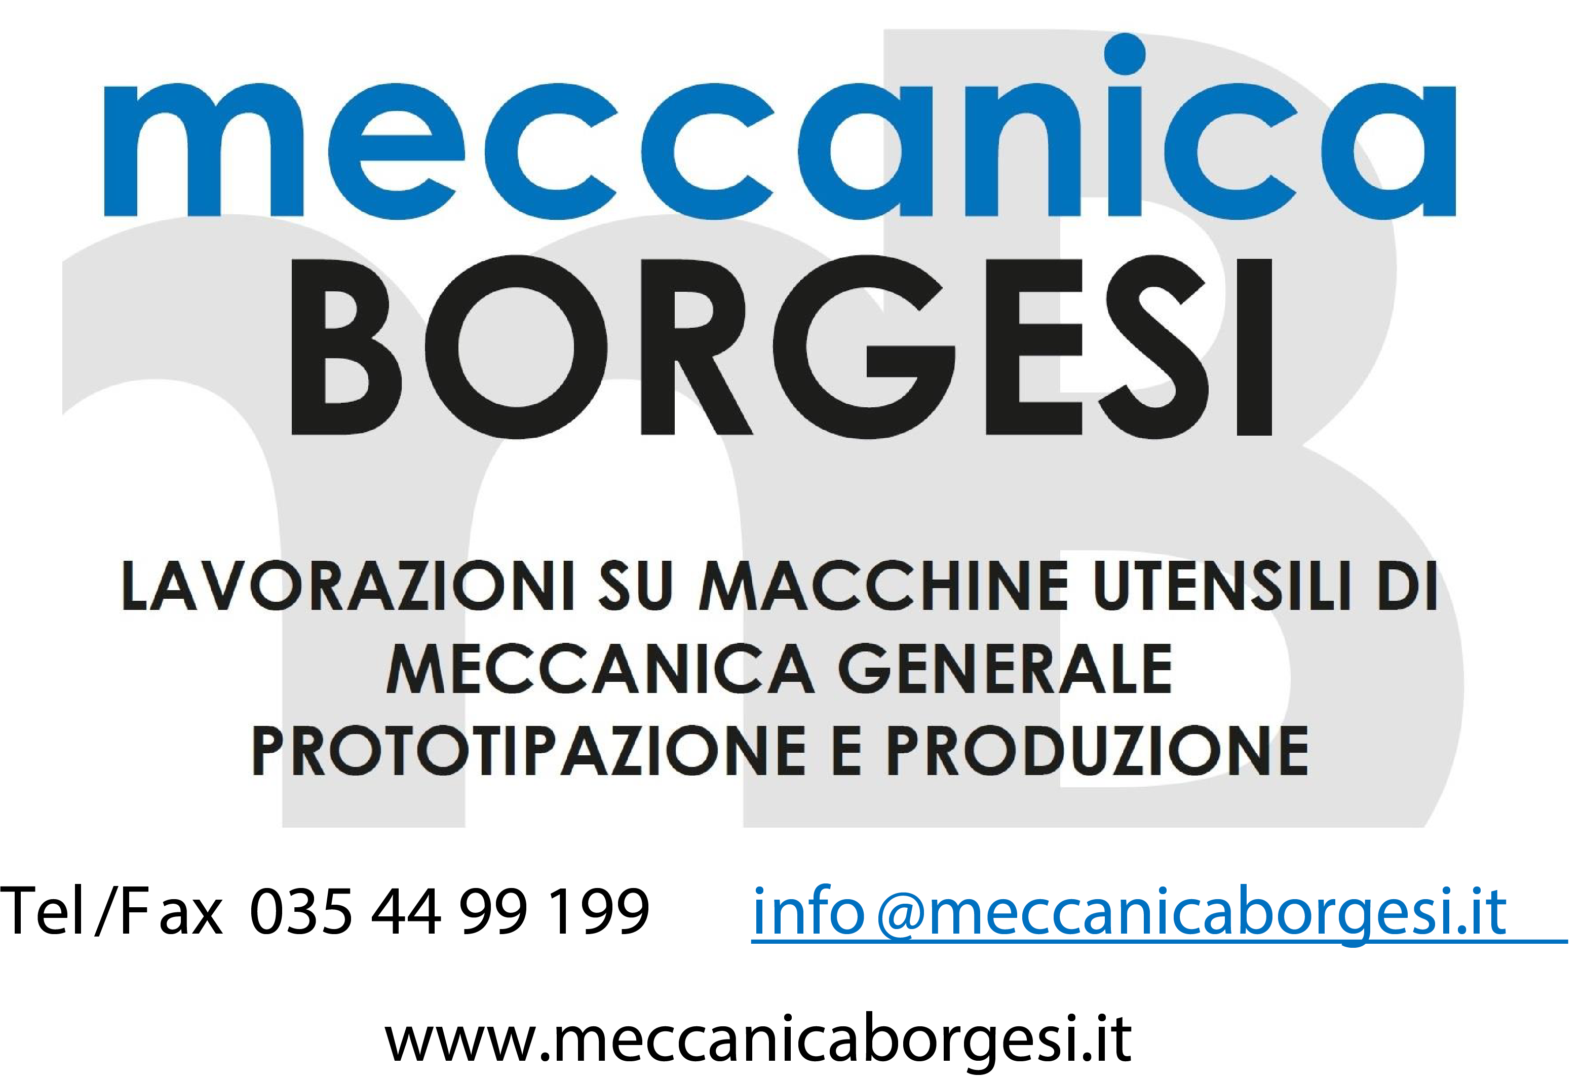 MECCANICA BORGESI